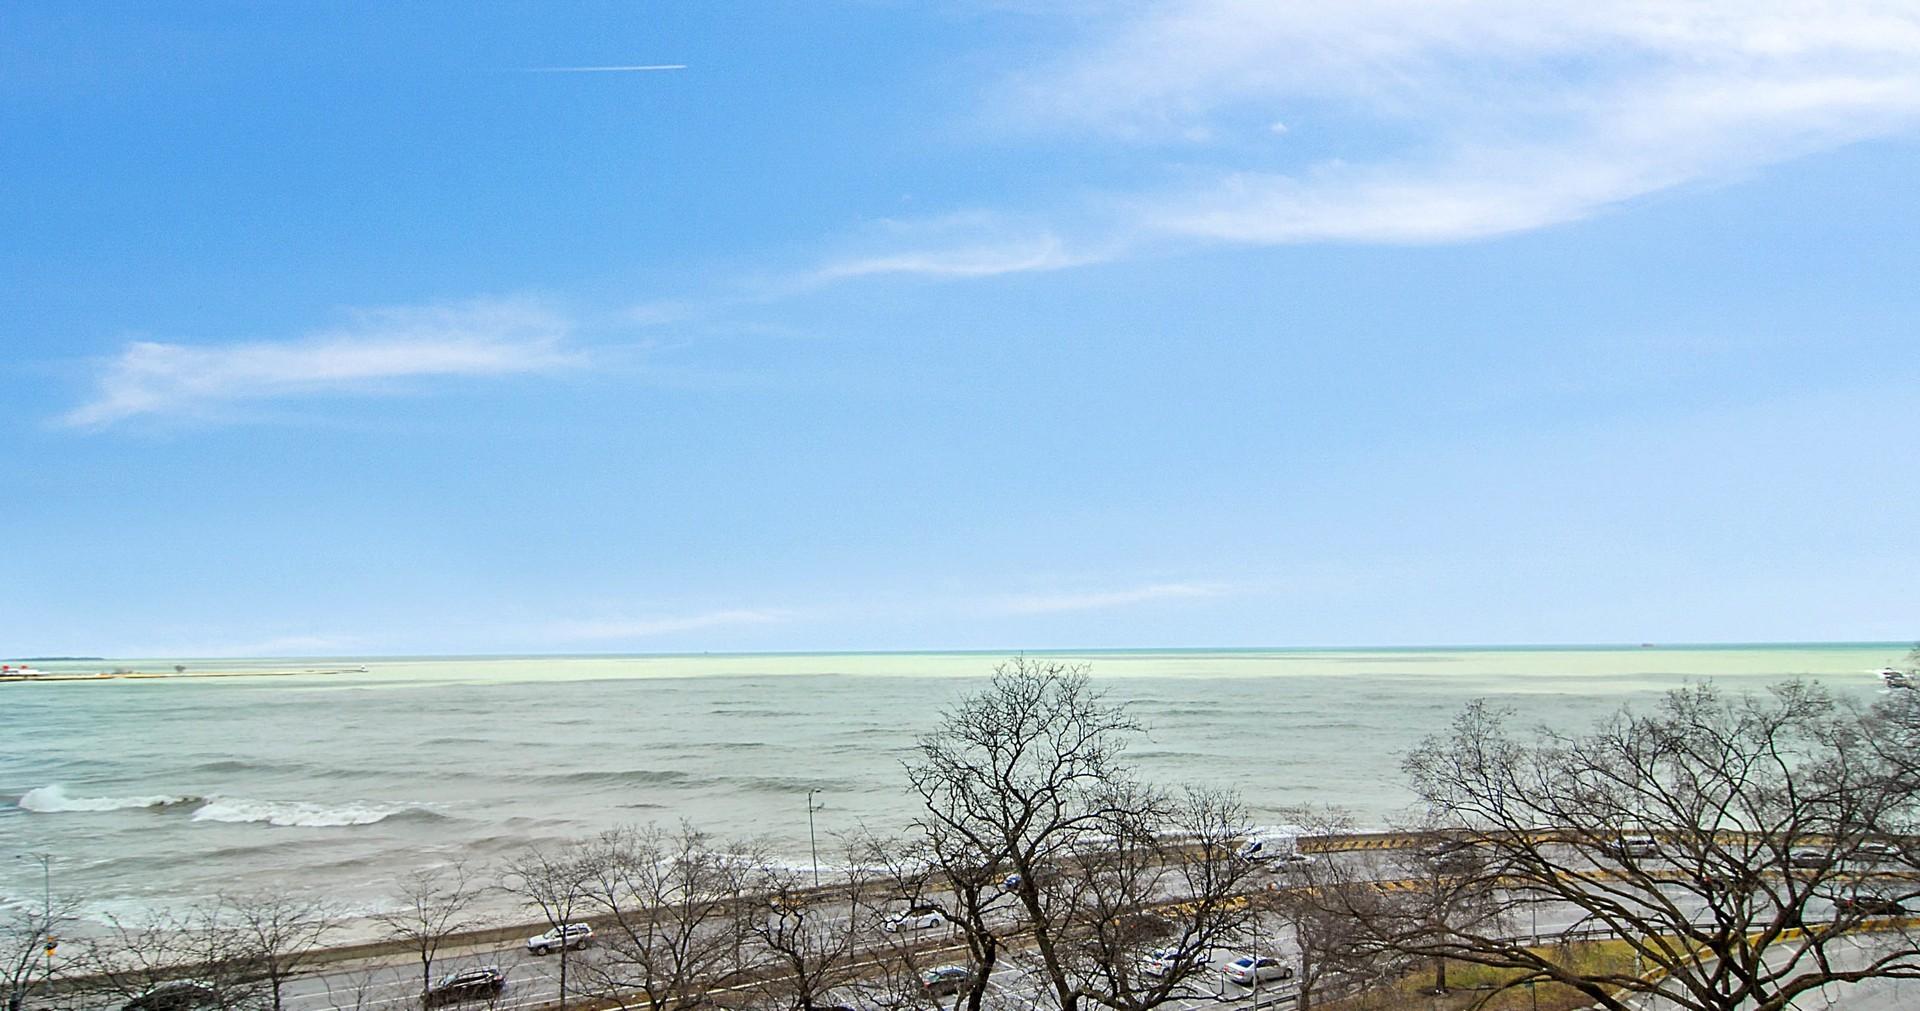 219 East LAKE SHORE 7CD, CHICAGO, Illinois, 60611